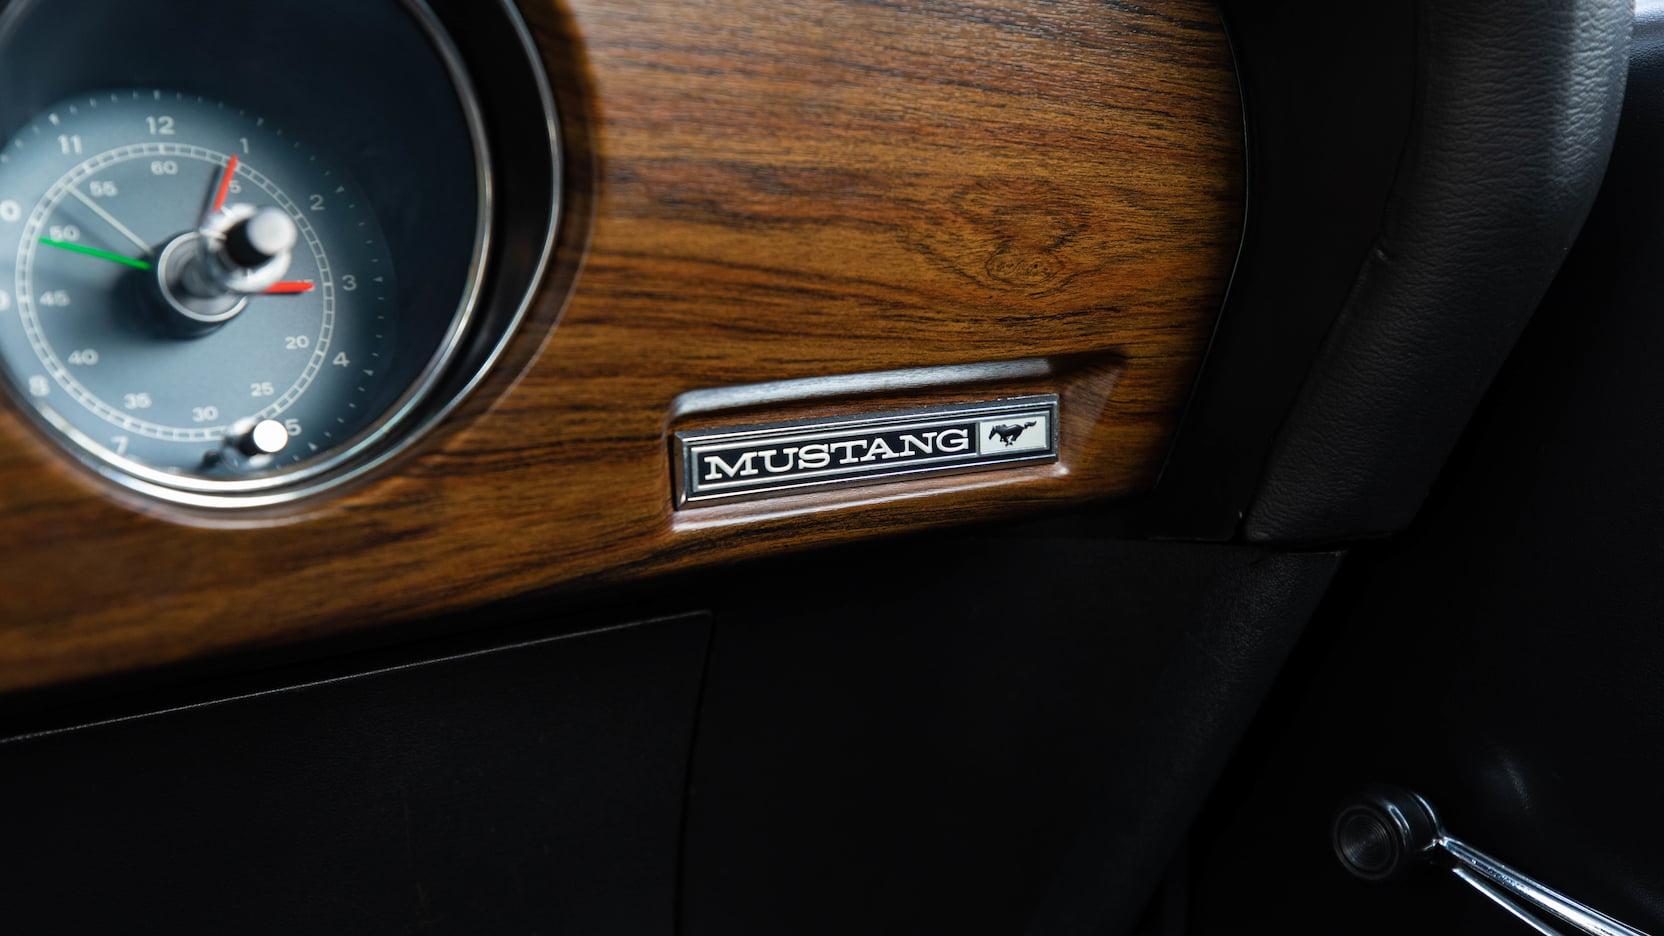 1969 Ford Mustang Boss 429 Fastback Dash Badge Close Up